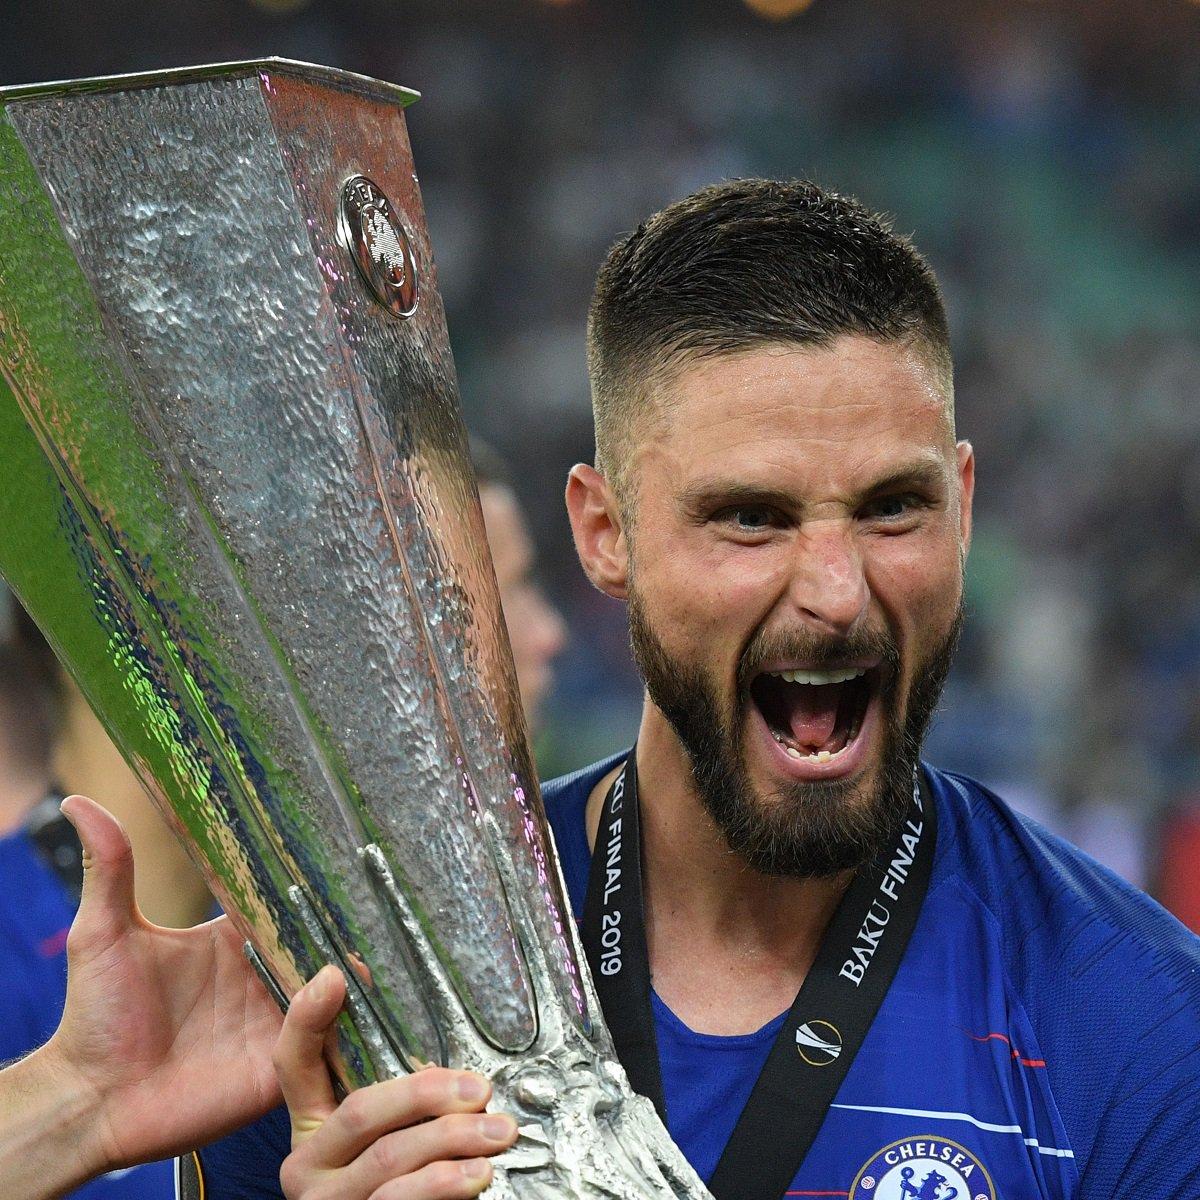 Chelsea, Arsenal, Europa League, trực tiếp bóng đá, Sarri, Unai Emery, Olivier Giroud, Petr Cech, chung kết Europa League